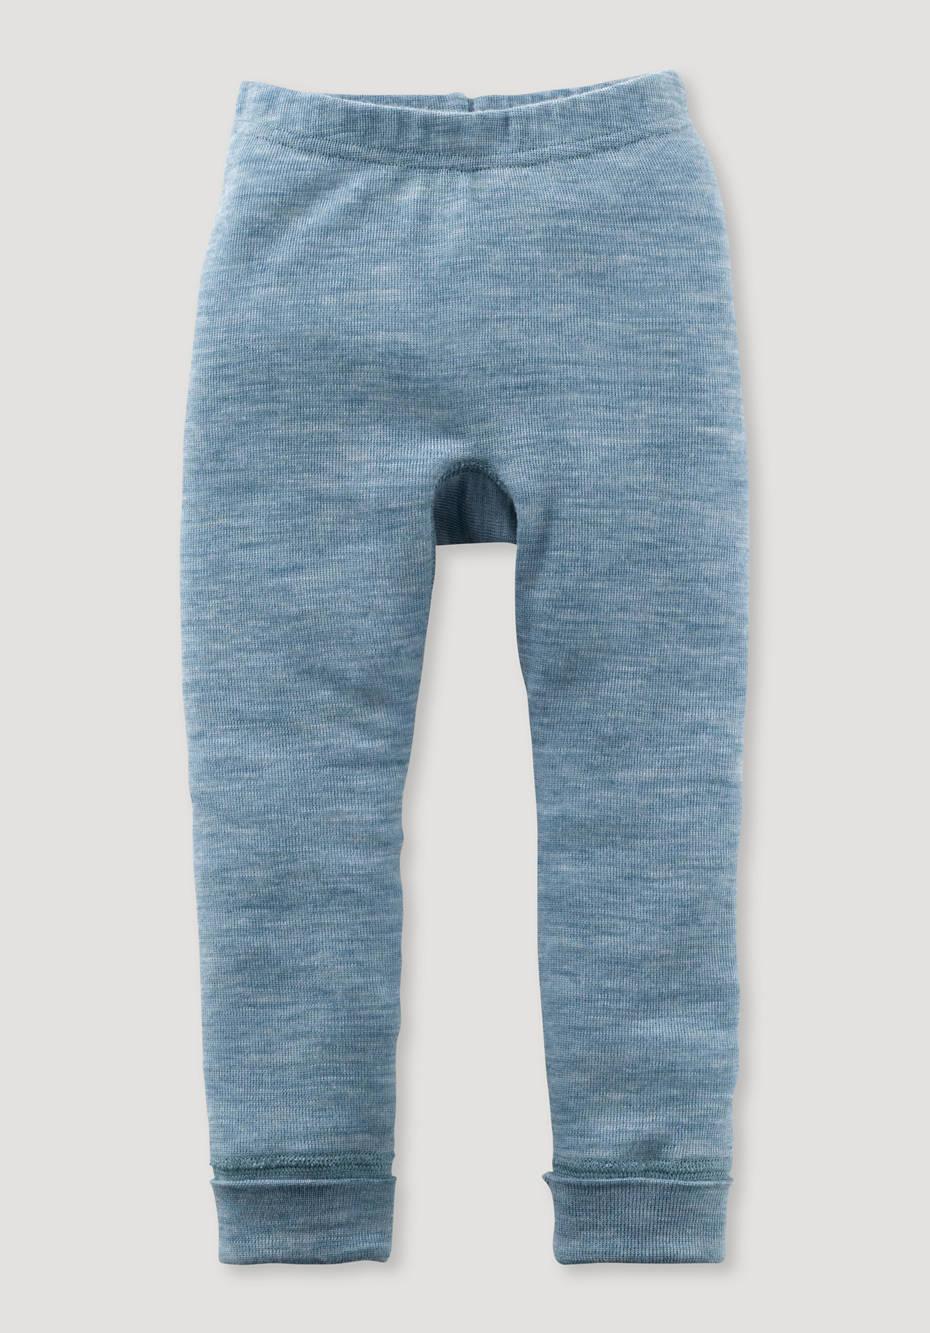 Long johns made of pure organic merino wool